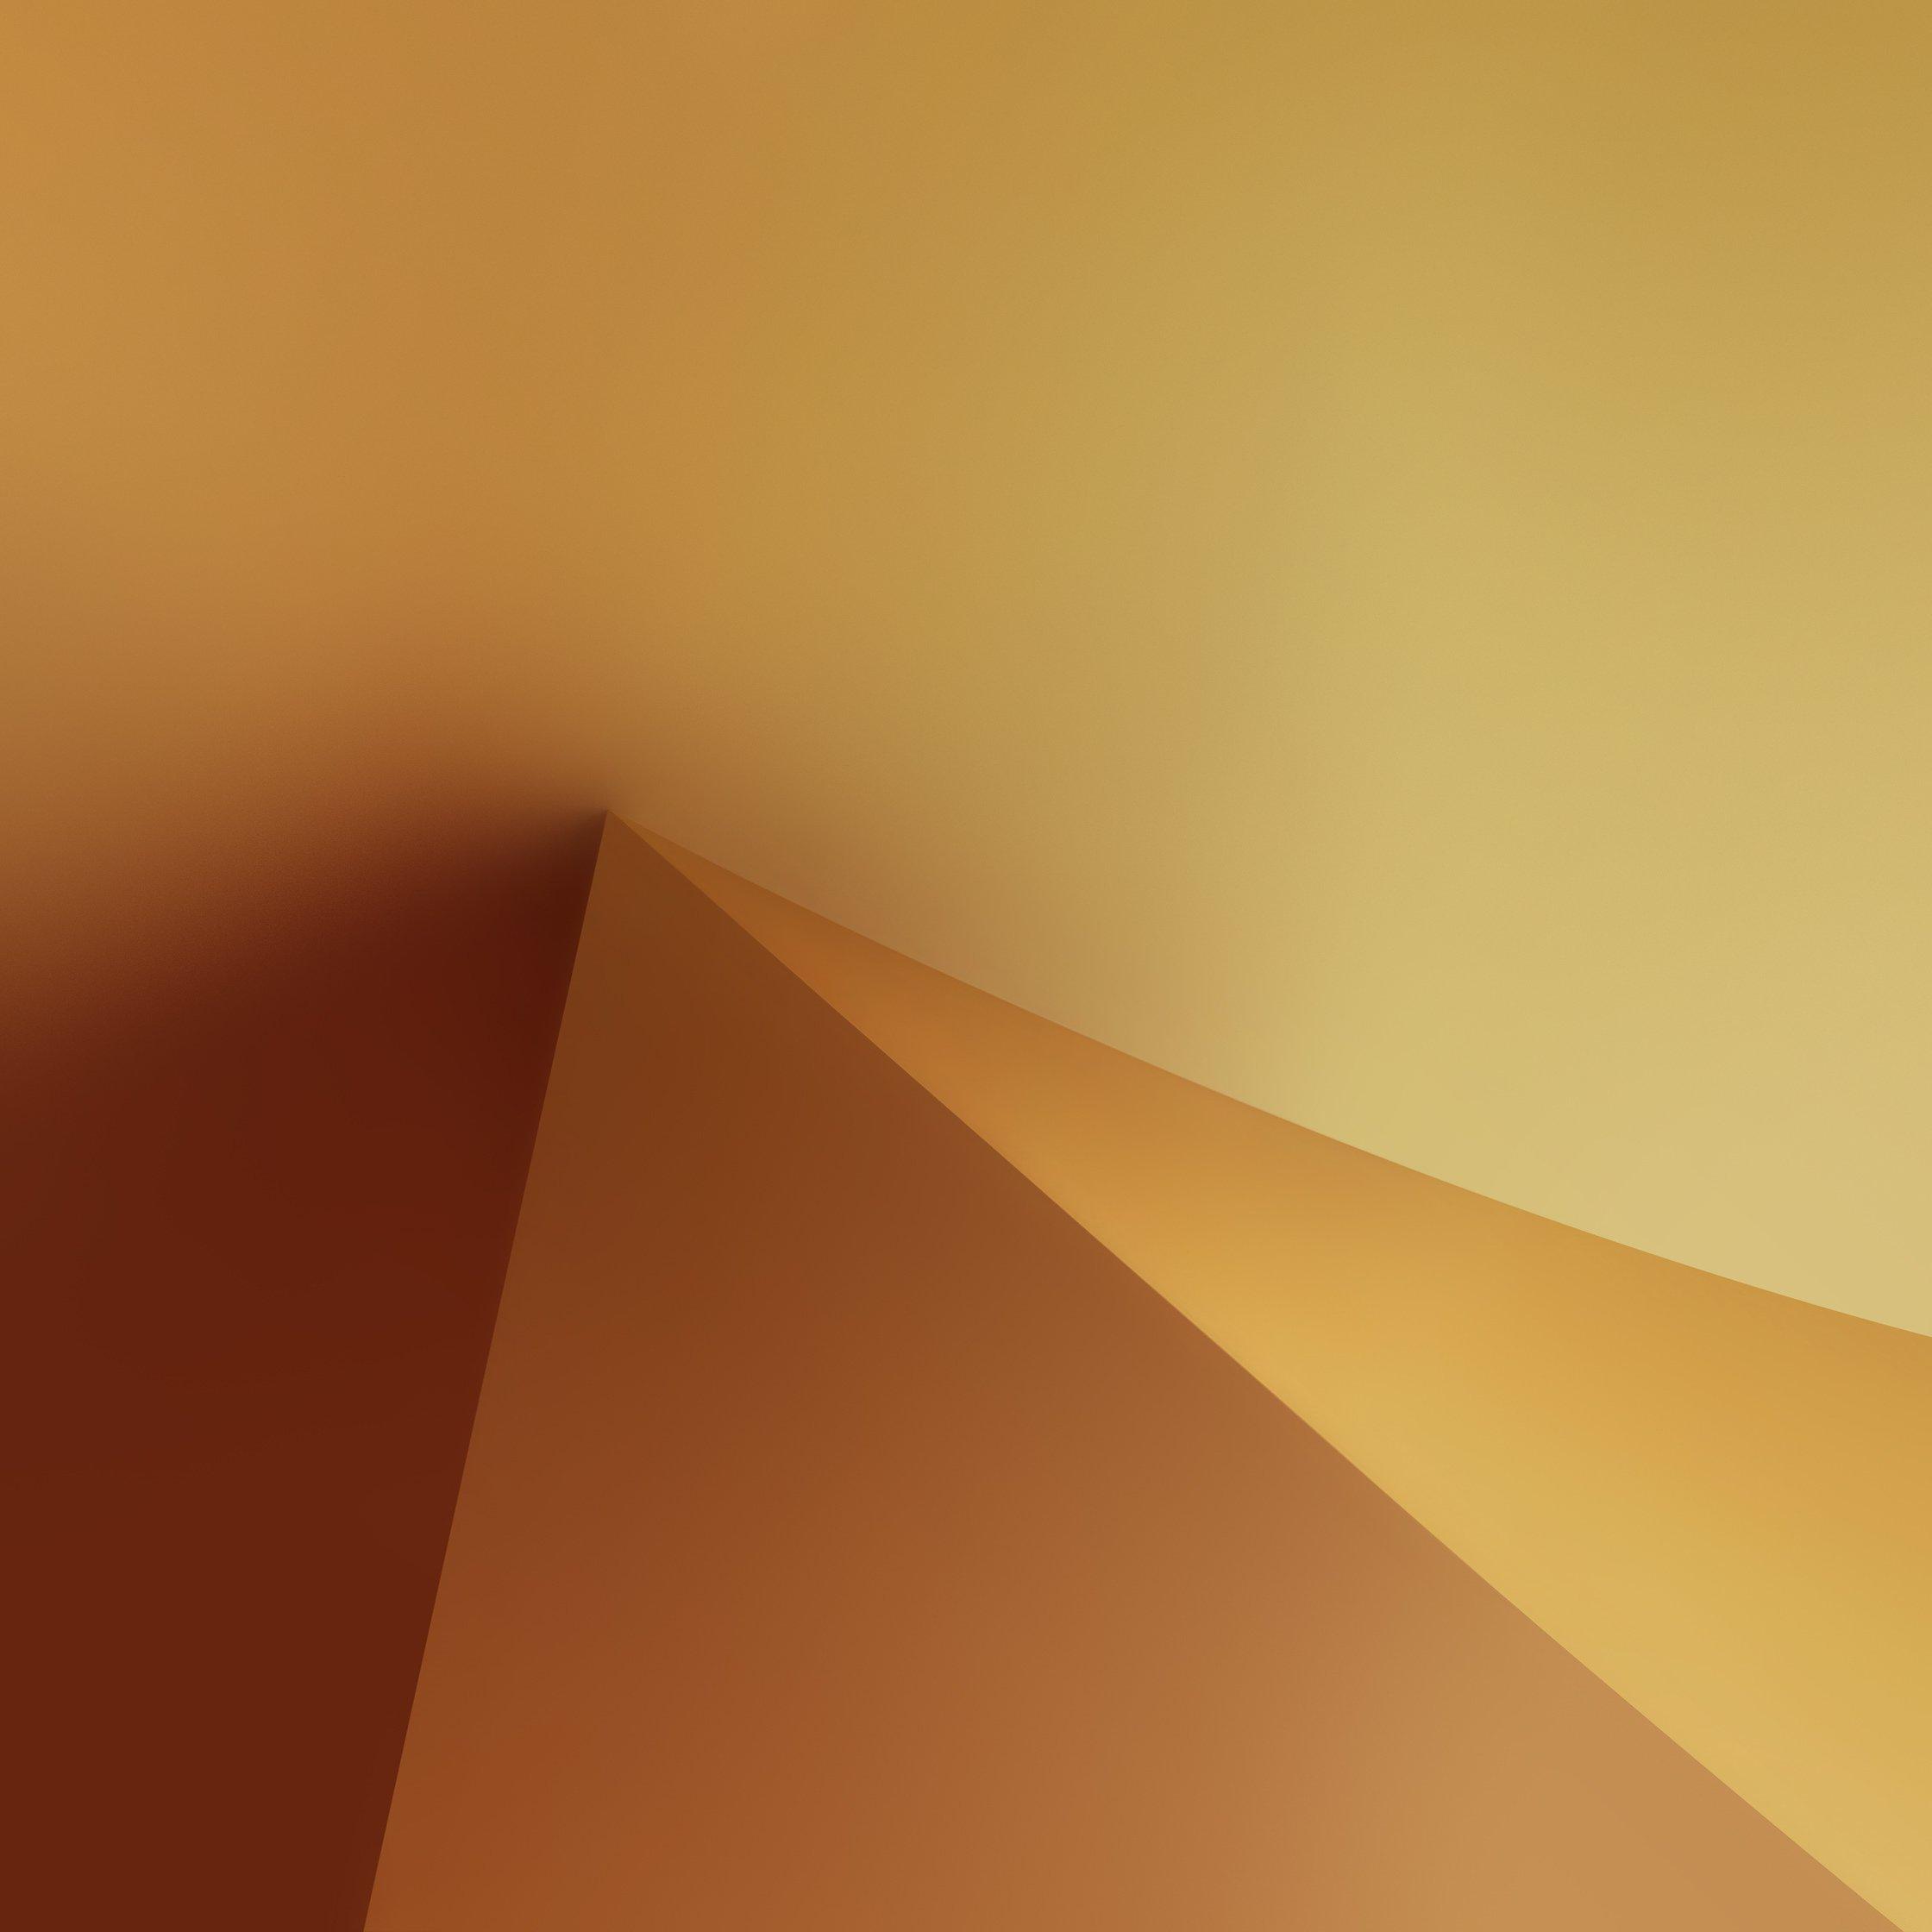 Samsung Galaxy Note 7-default_wallpaper_gold-w2240